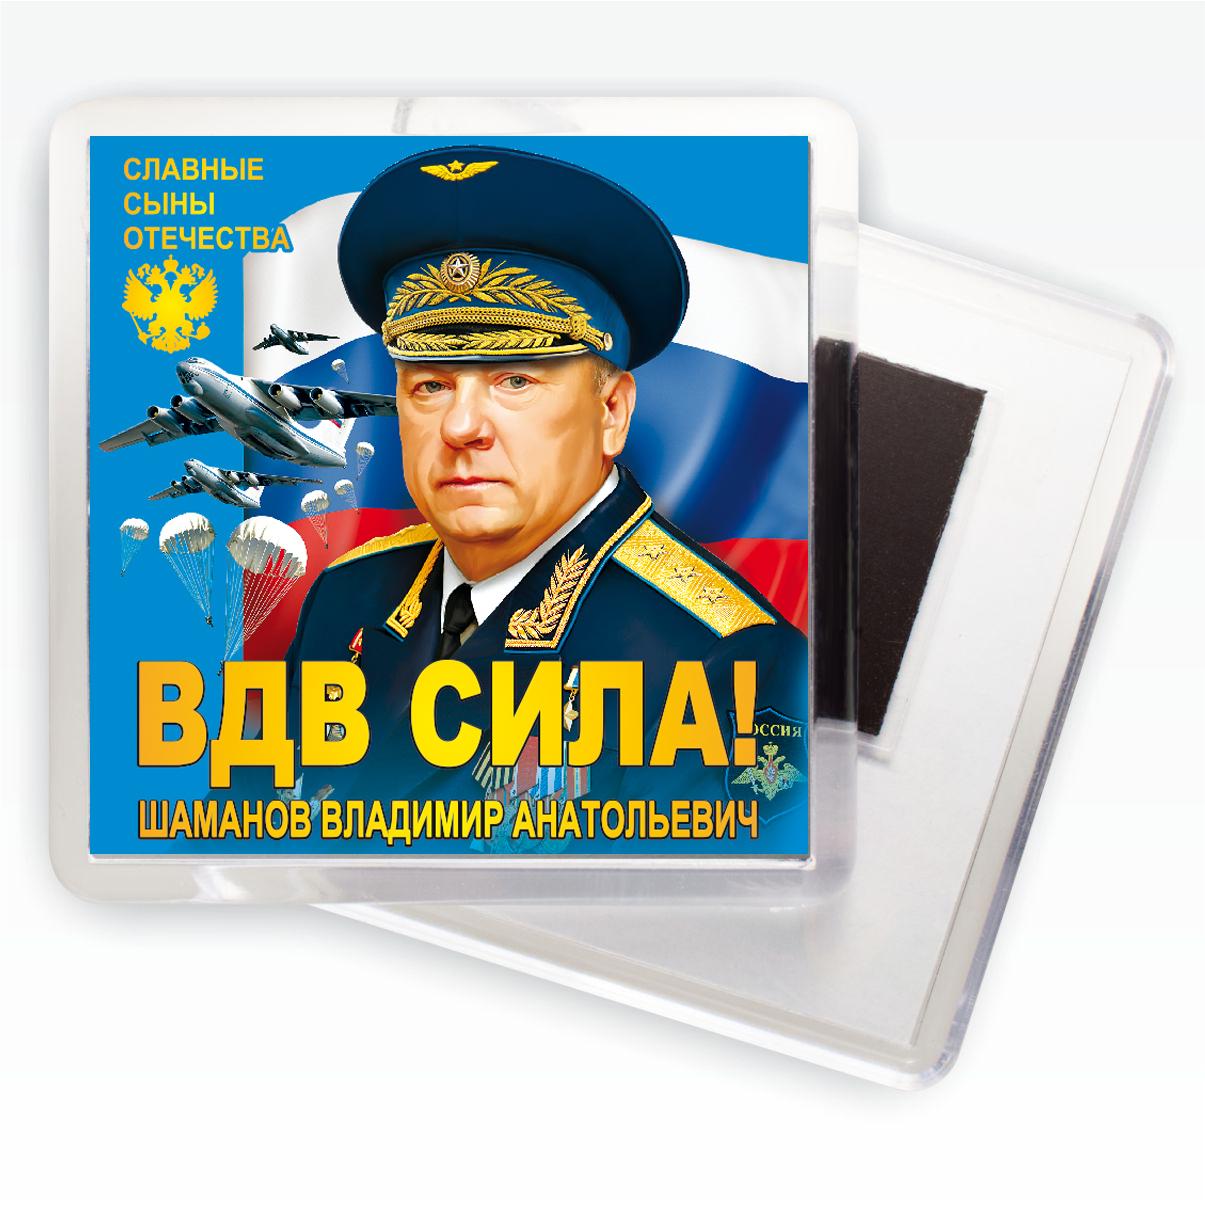 Магнит Шаманов